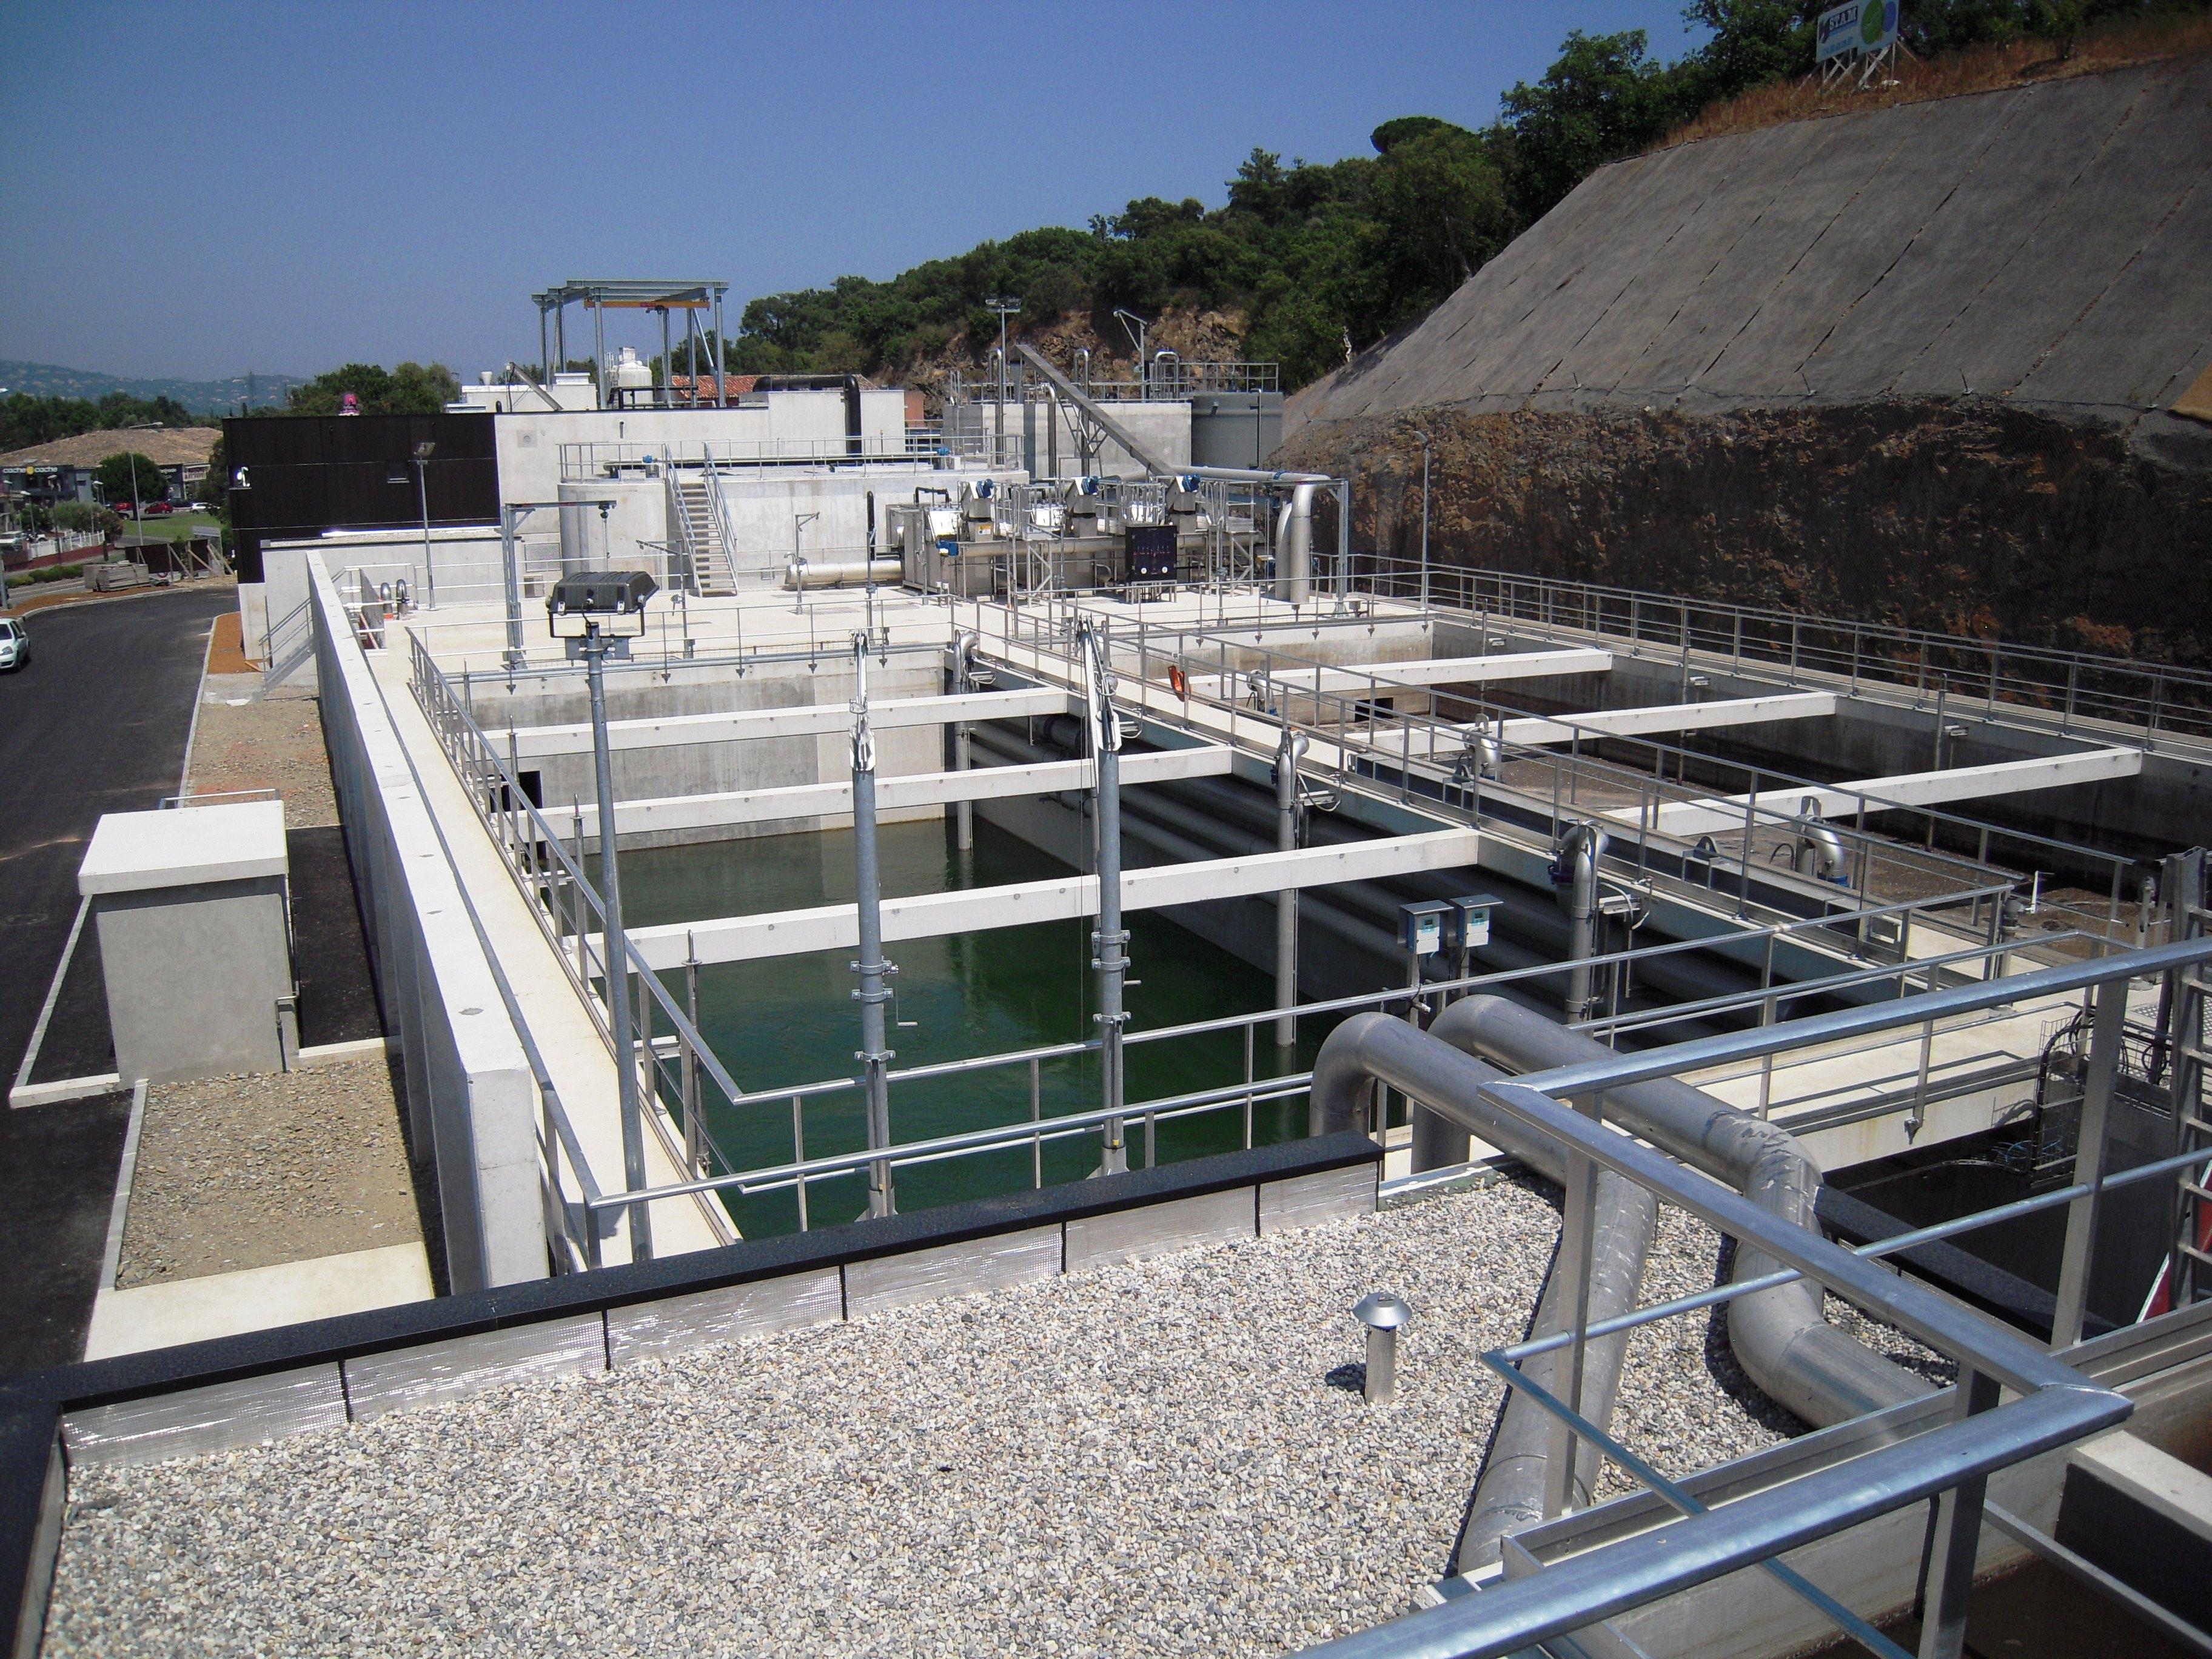 épuration biologique par membranes plaques d'ultrafiltration - Ultragreen station Cogolin